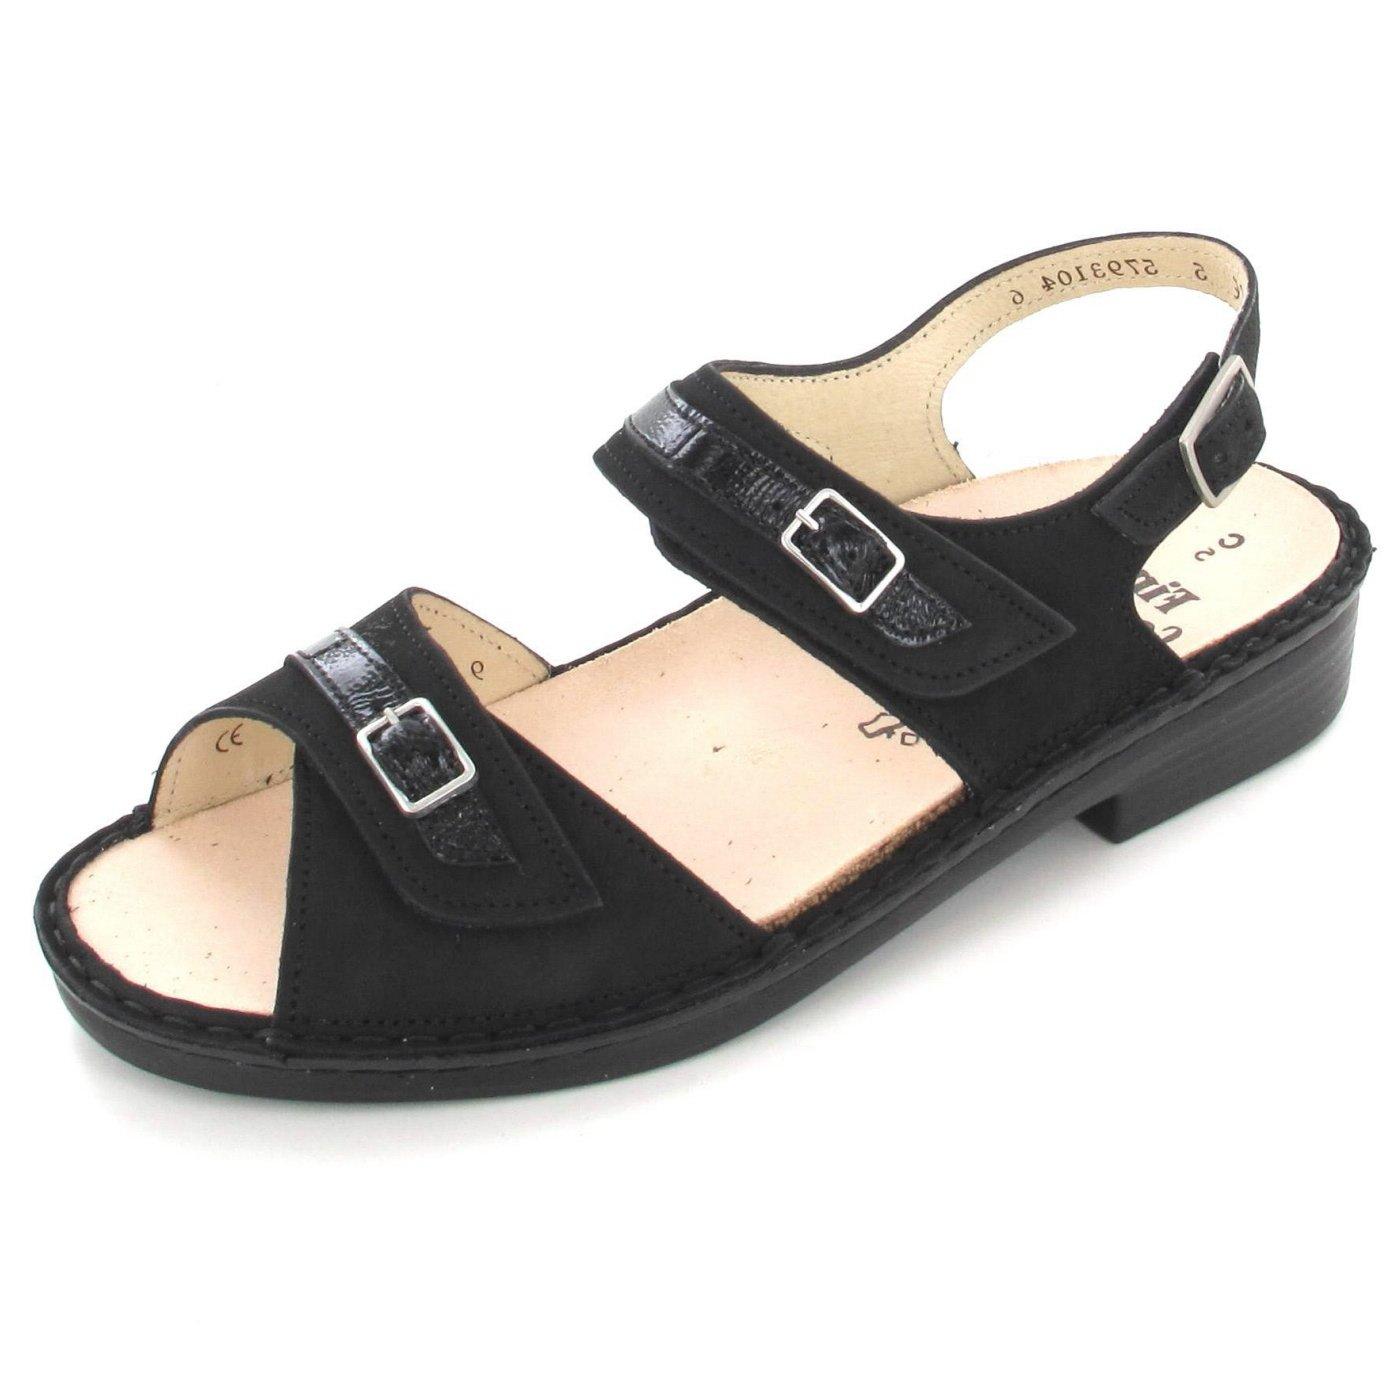 Finn Comfort Women's Sasso Fashion Sandals, Black, Leather, Rubber, 6 UK / 8.5 M US